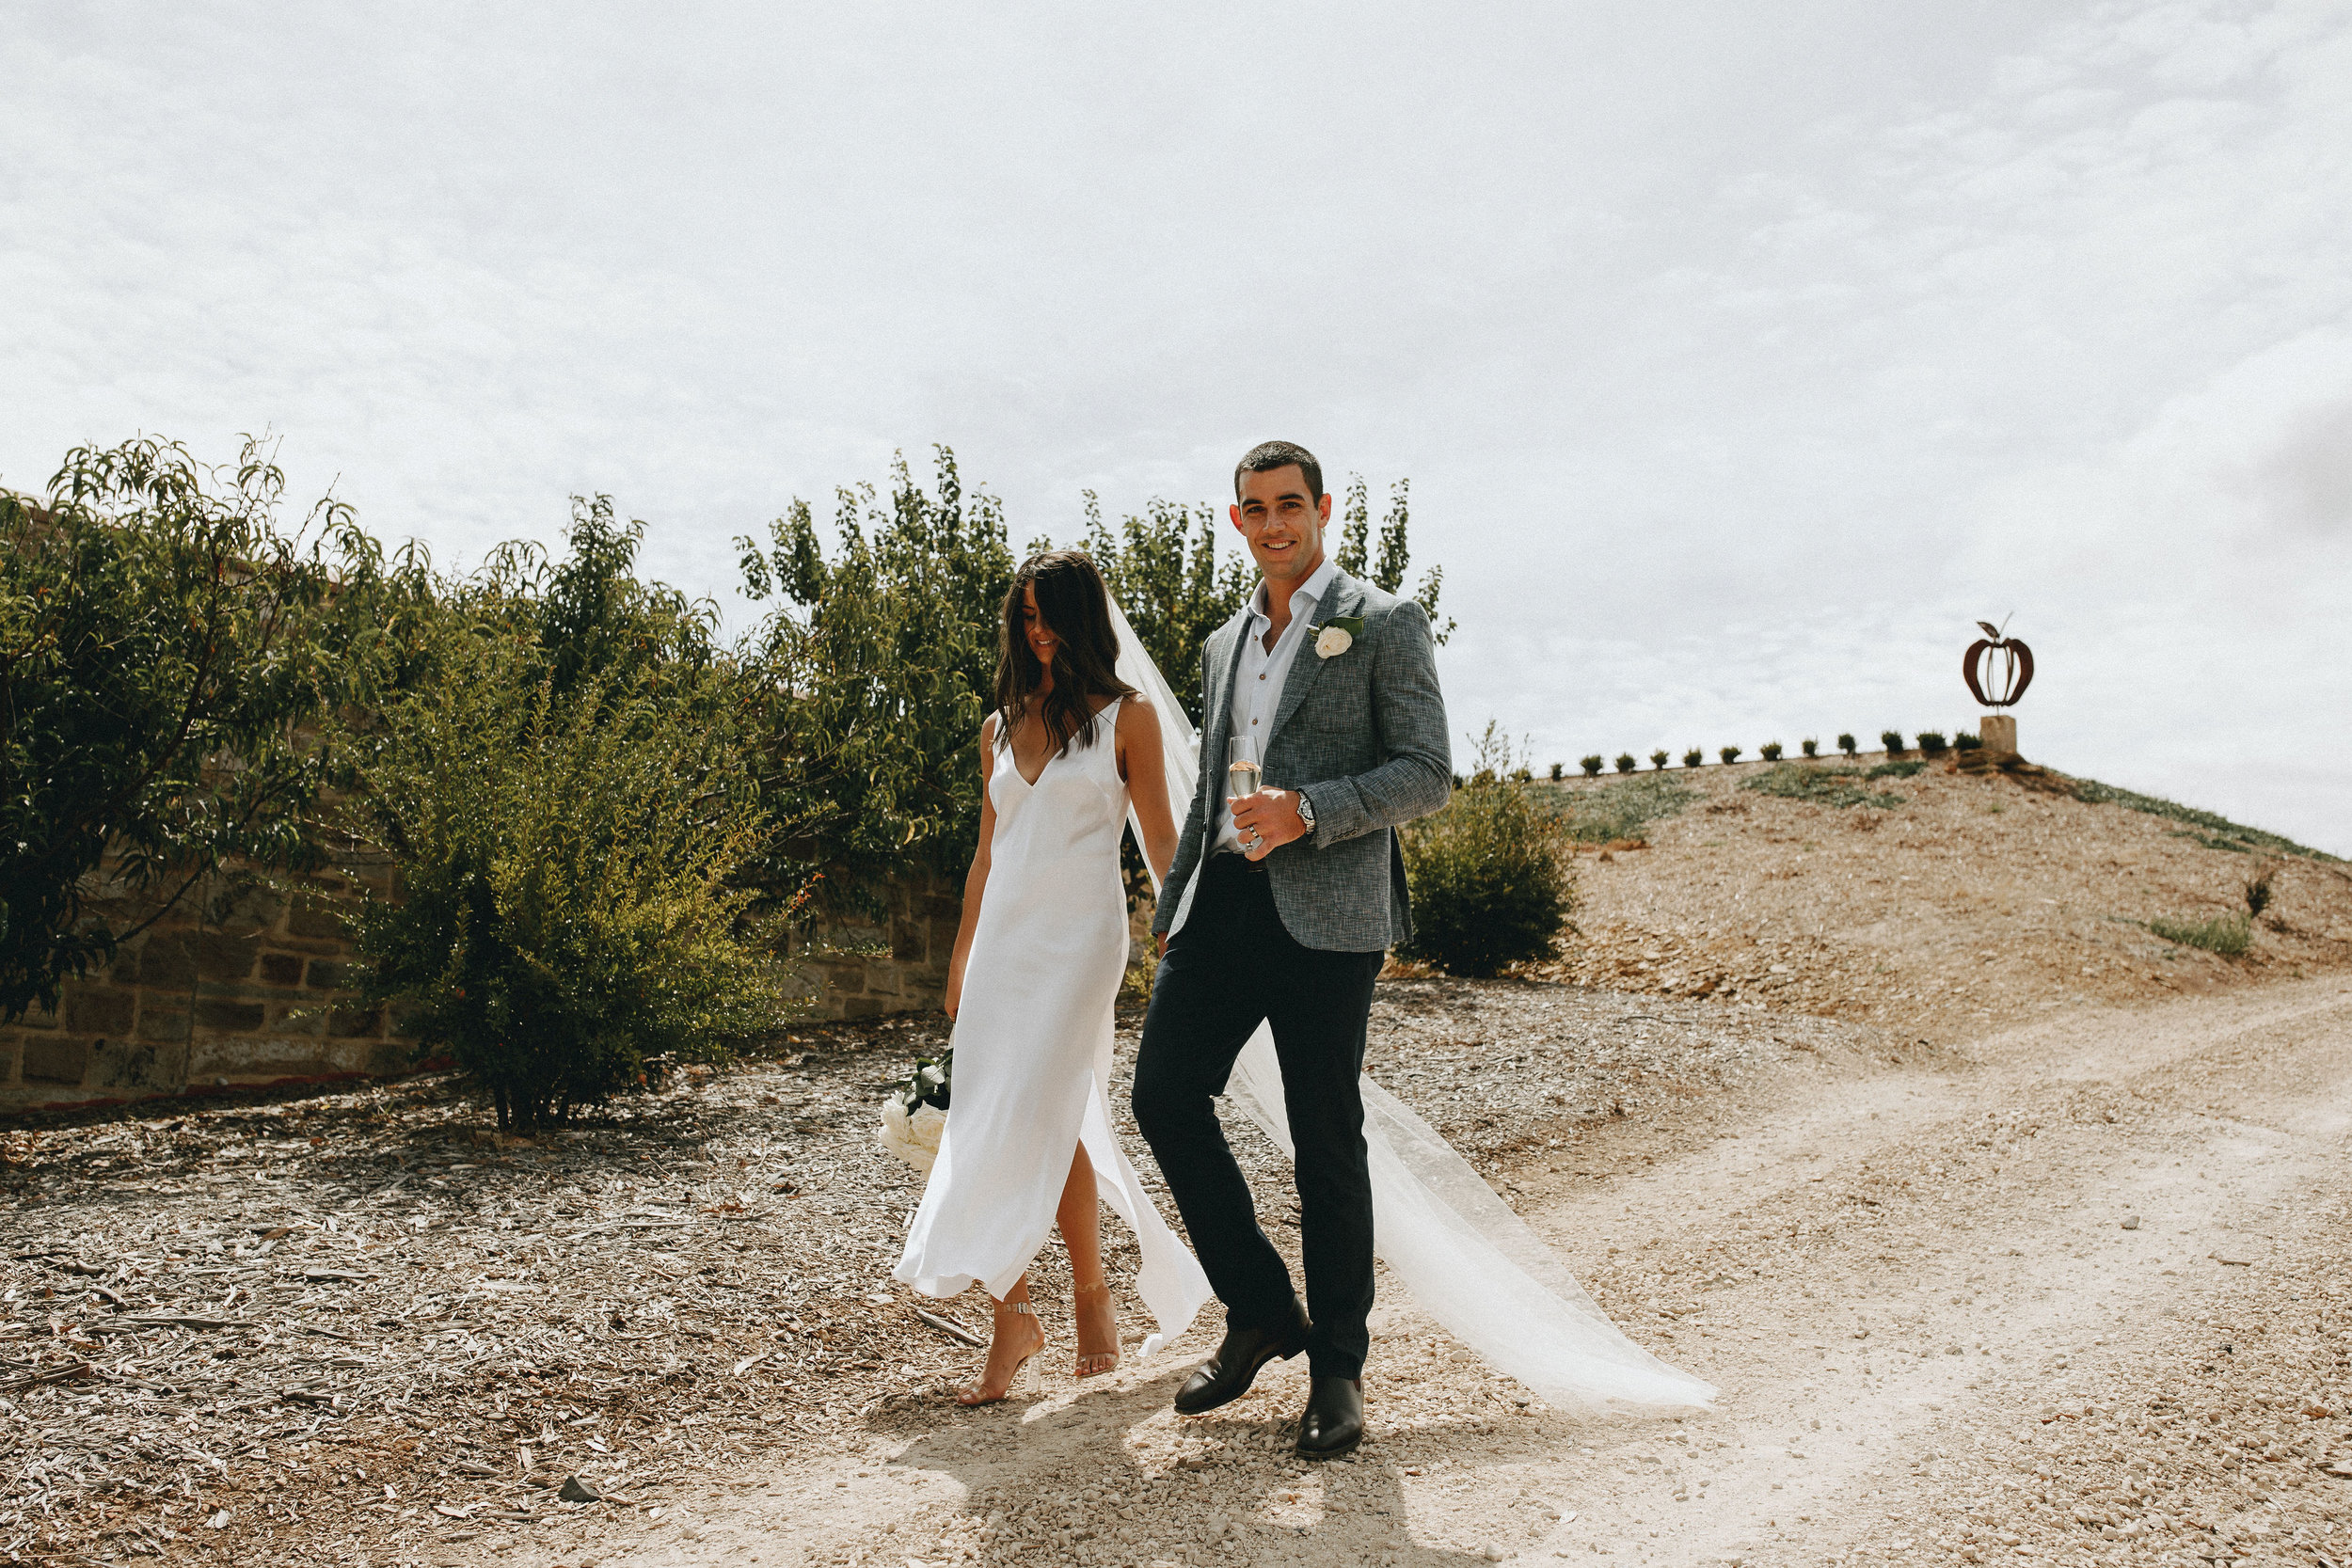 BYBHS_WEDDING_TAYLOR&ELLIE_HI-RES_17.jpg